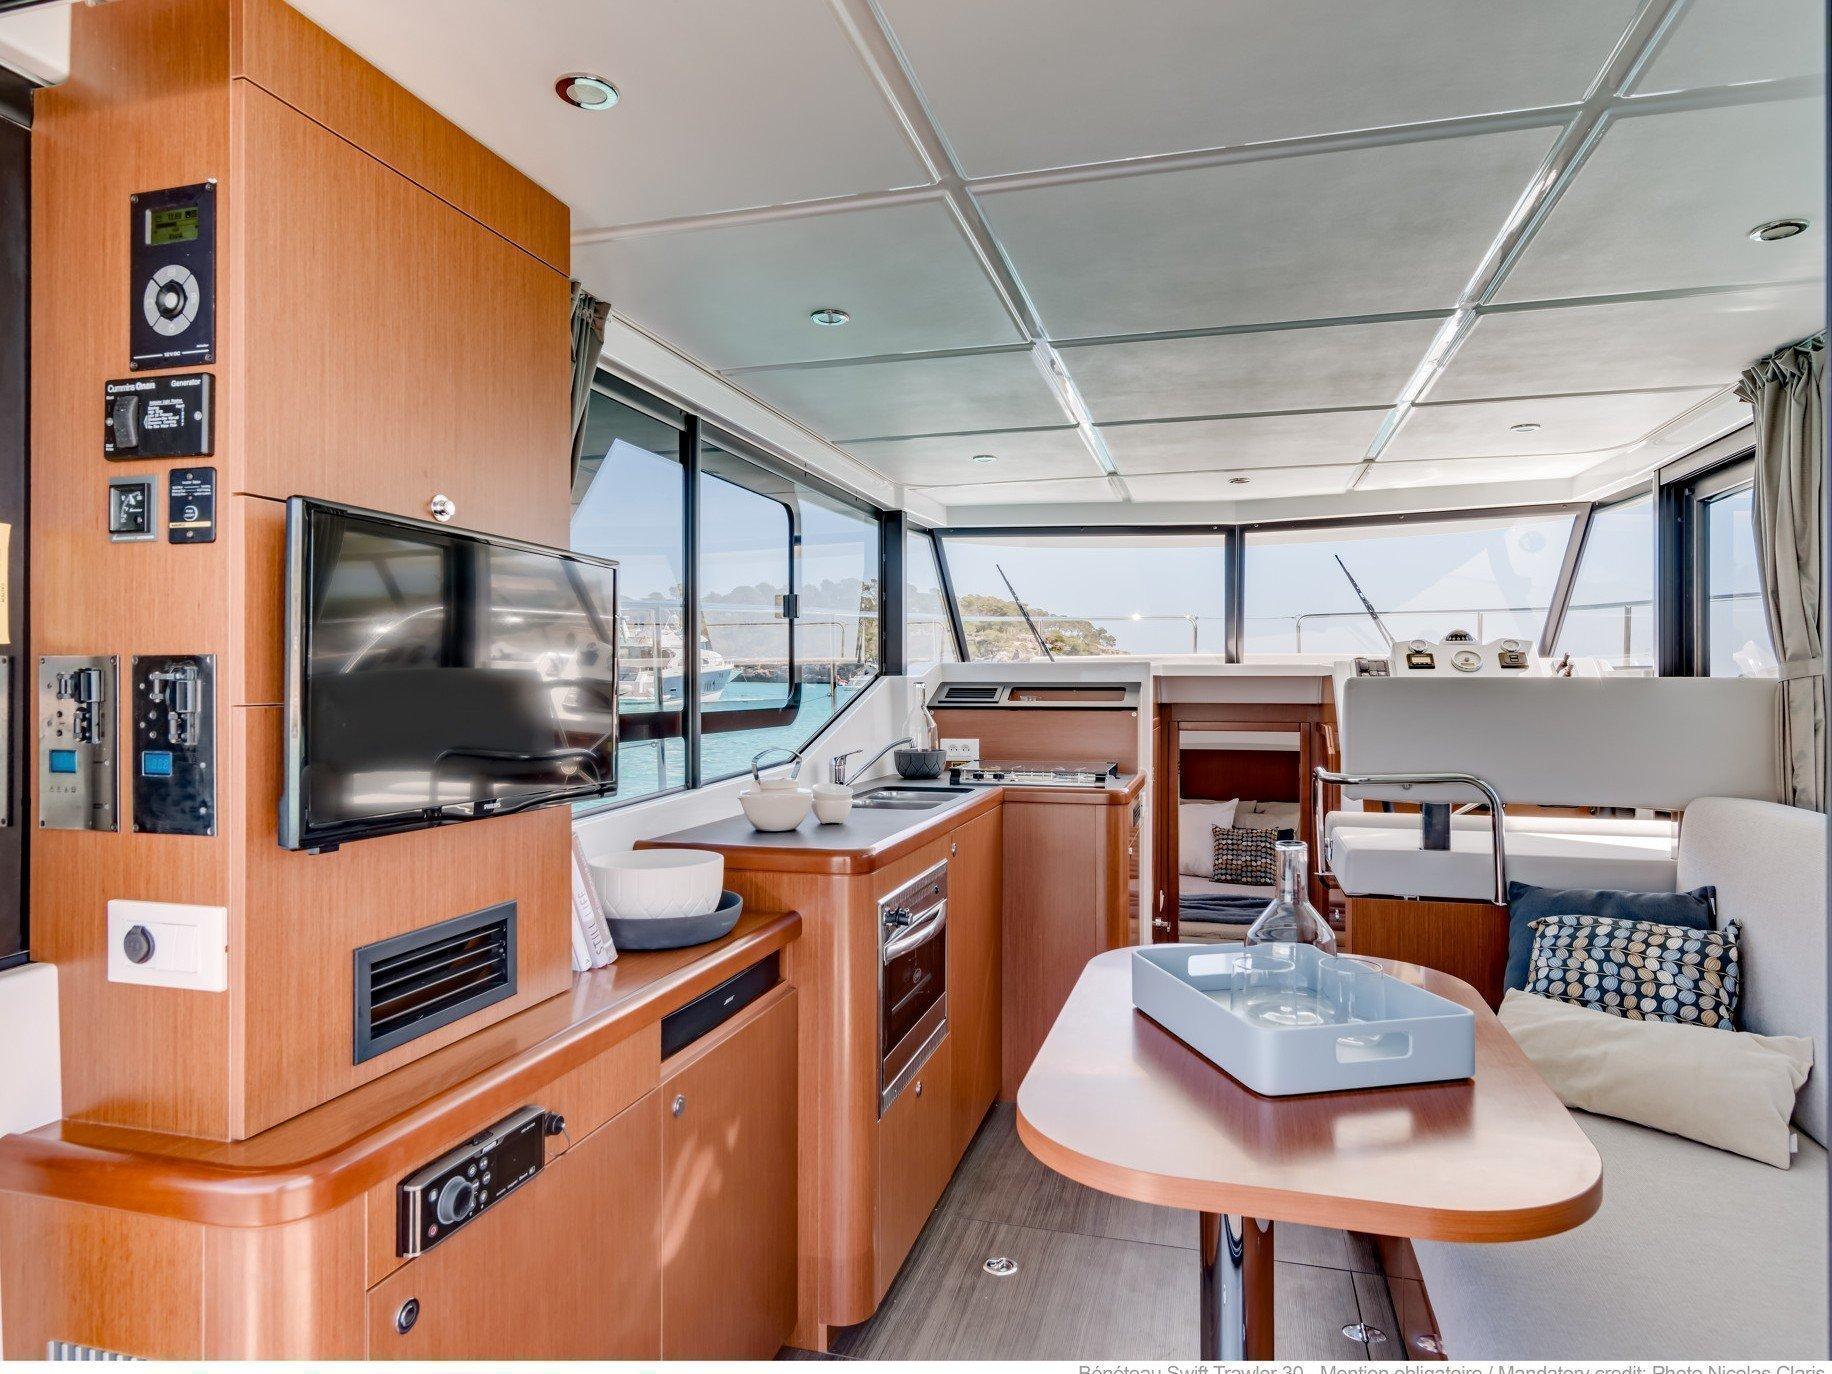 Beneteau Swift Trawler 30 (Odysseus) Interior image - 4